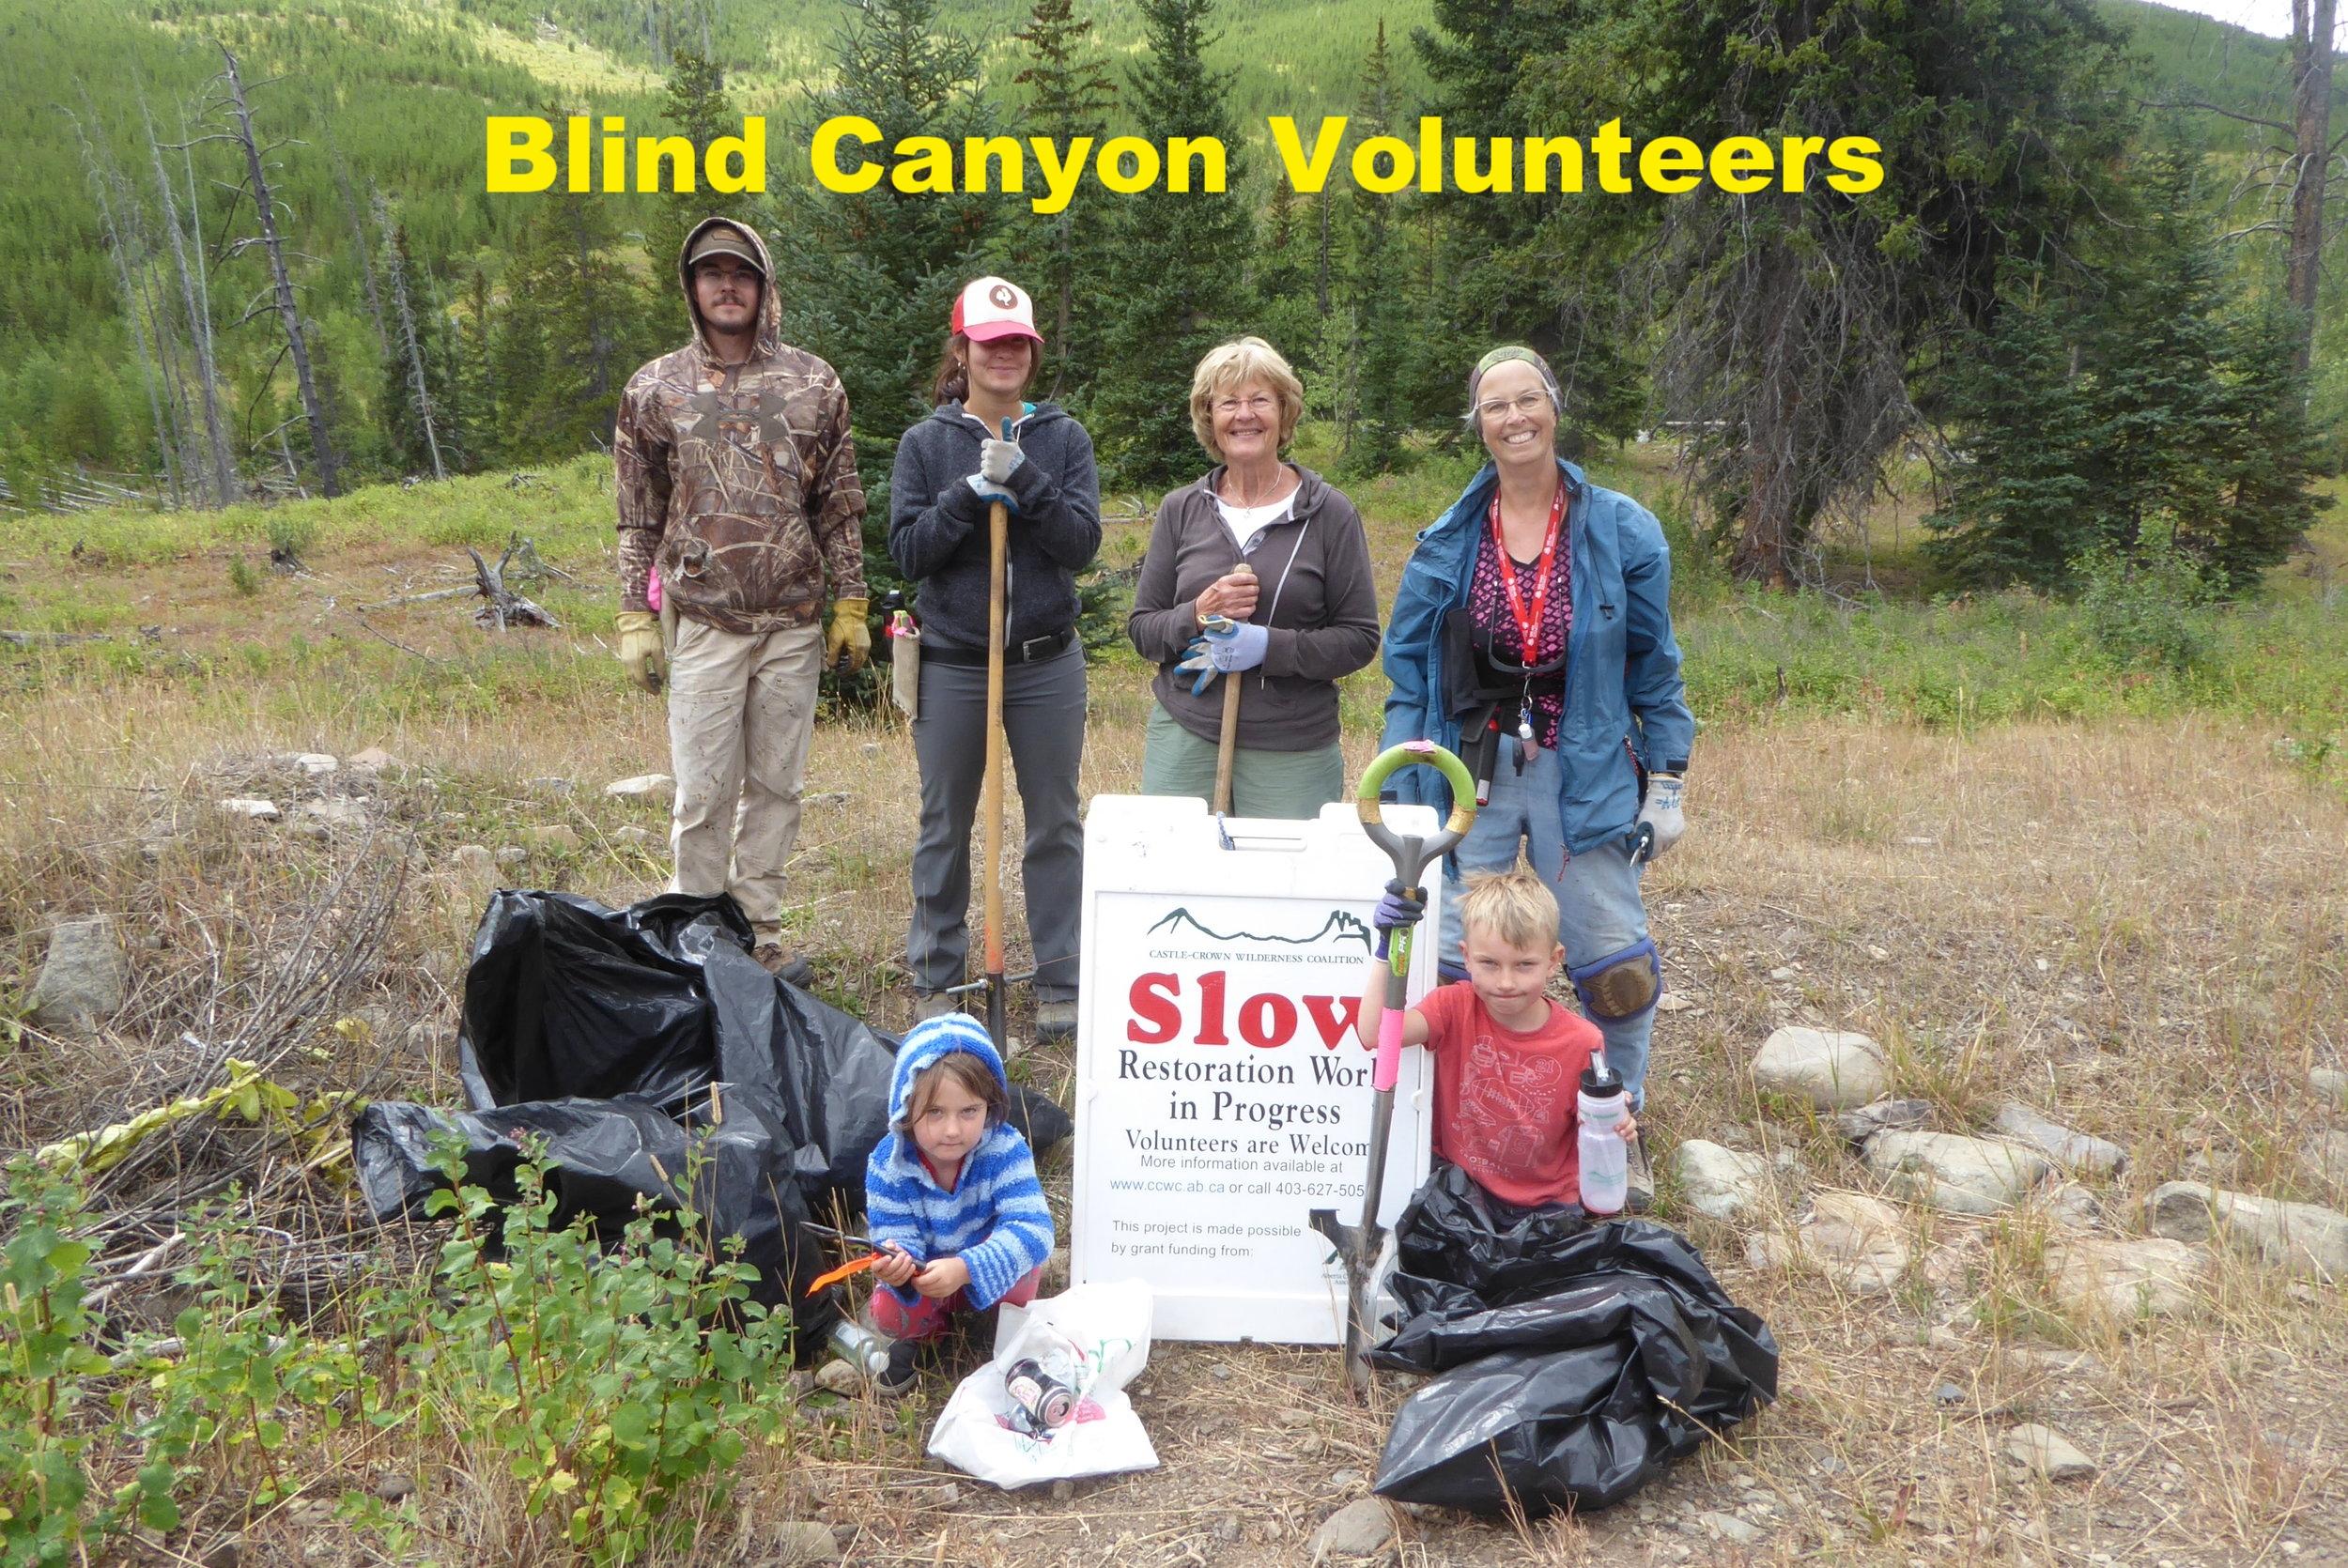 group_Blind_Canyon 14 Aug 17.jpg